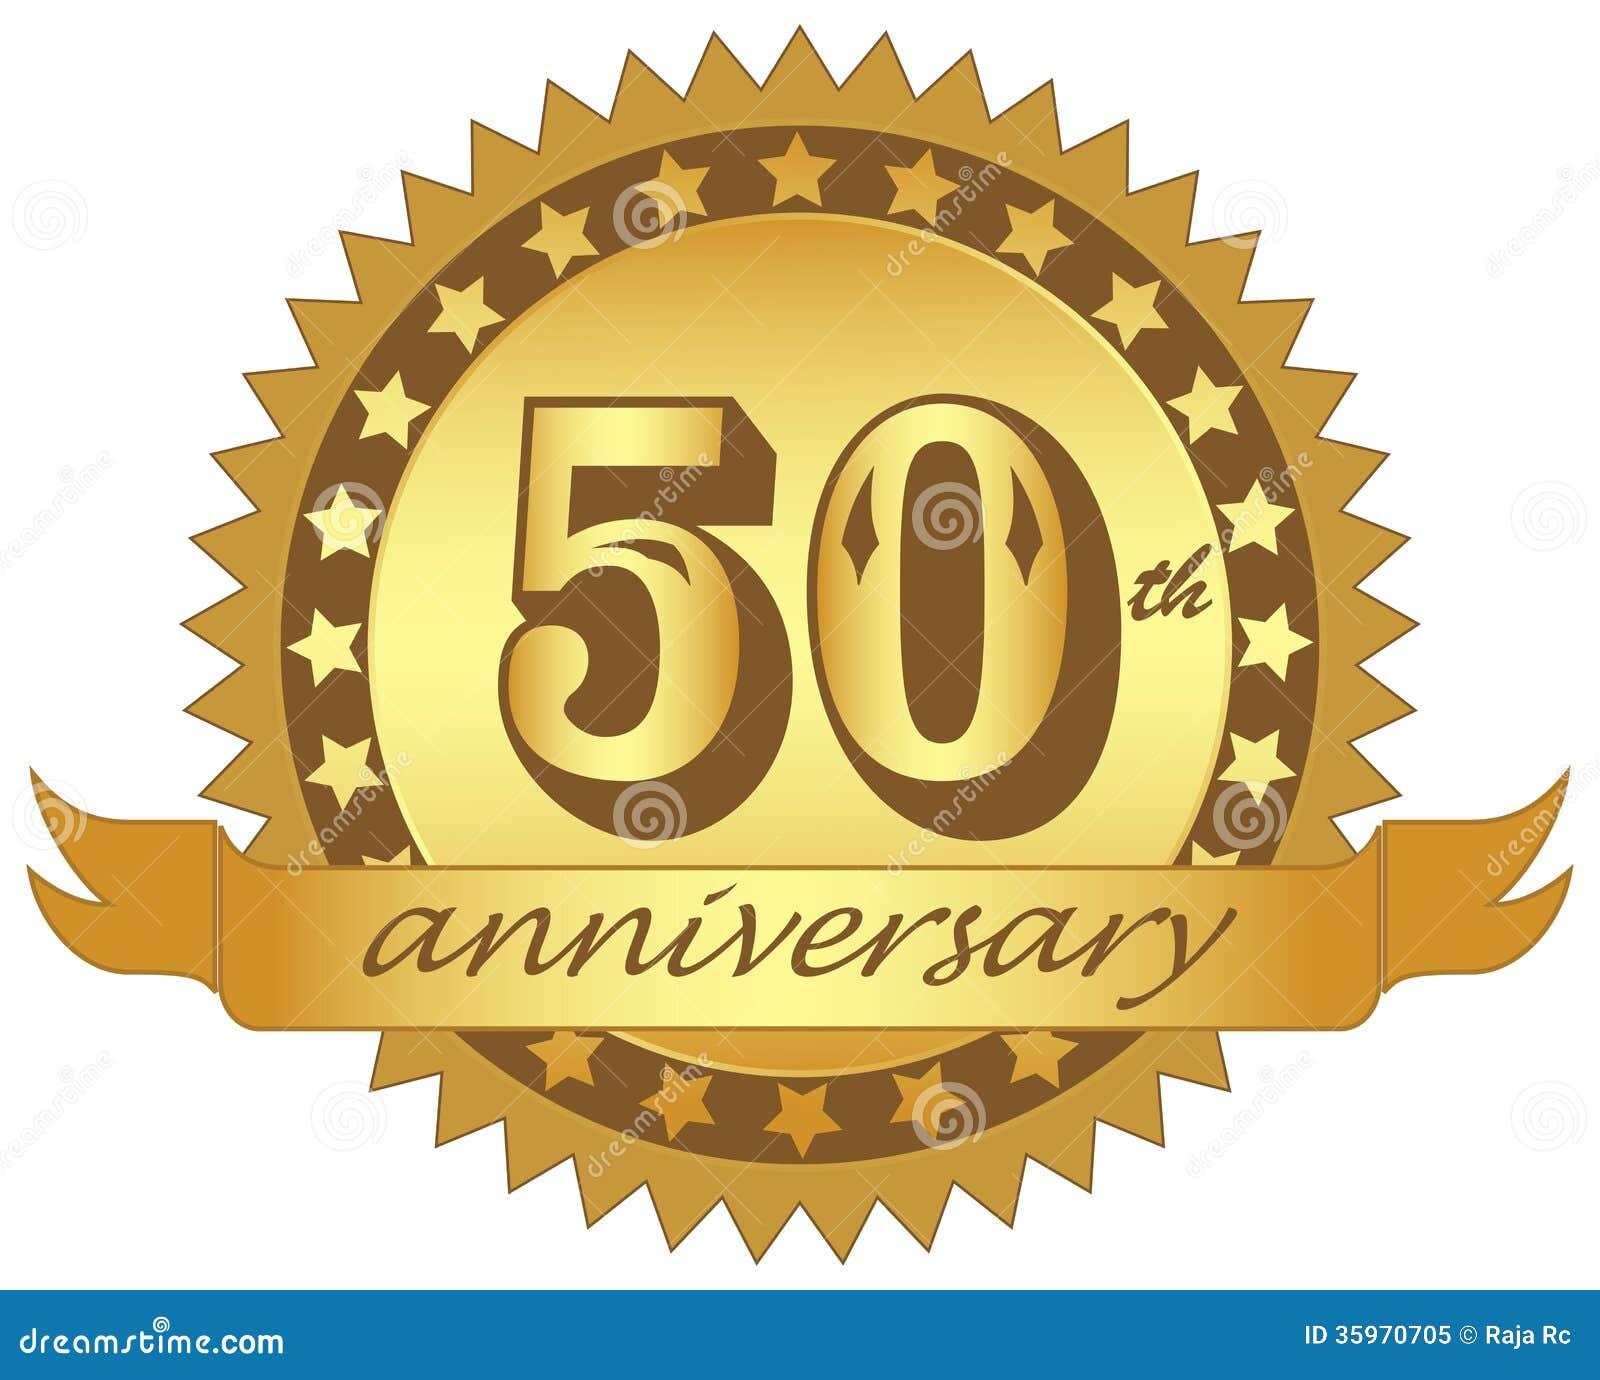 Anniversary Royalty Free Stock Photo - Image: 35970705